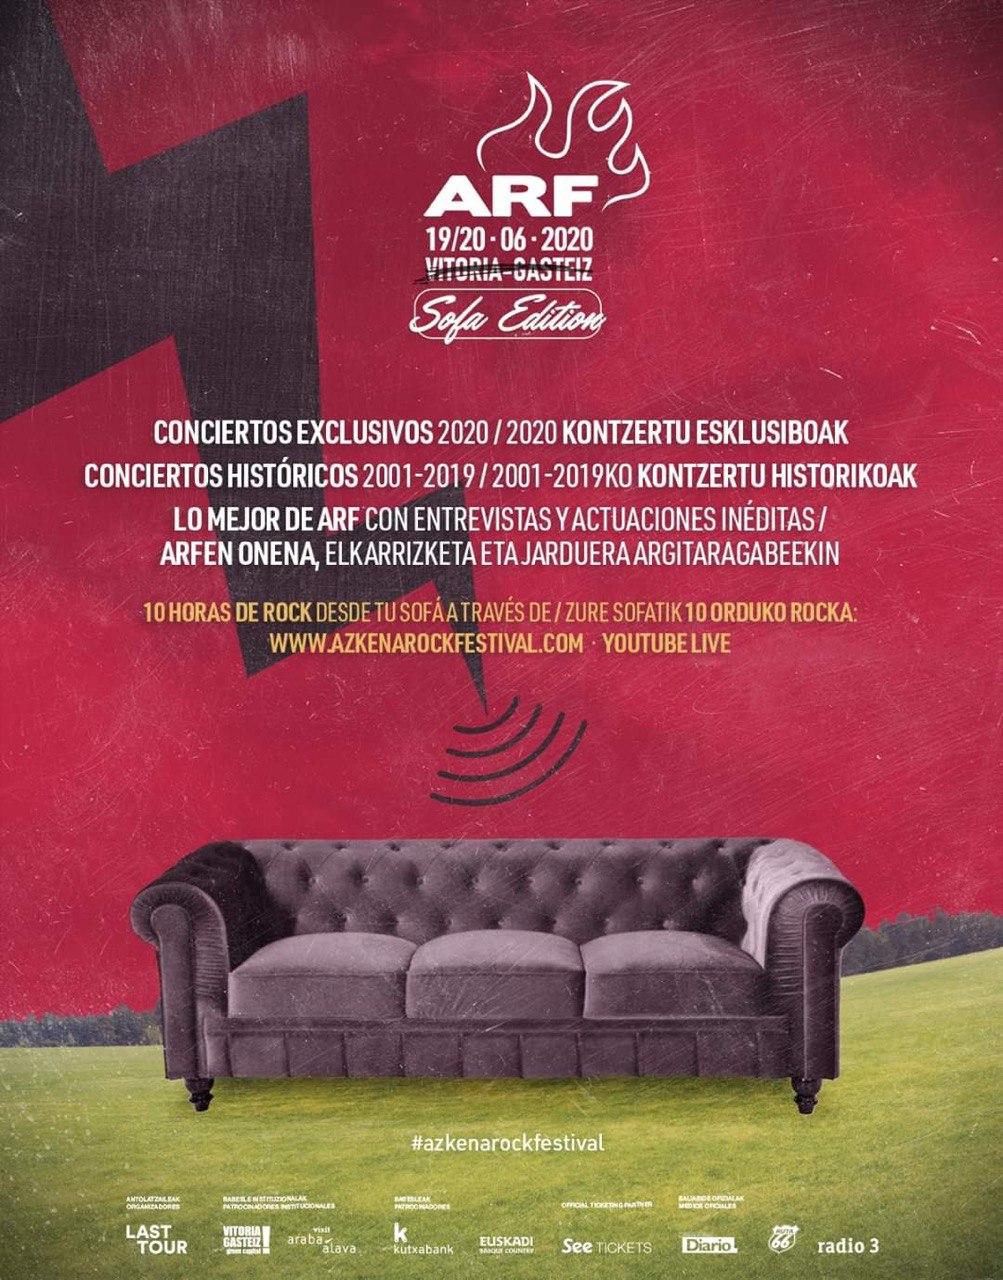 Azkena Rock Festival 2021. 17-18-19-Junio!!! 3 días. Iggy Pop!!!!. Black Mountain, Brian Wilson, Fu Manchu, L7, Patti Smith, Social Distortion.... - Página 6 2020-039